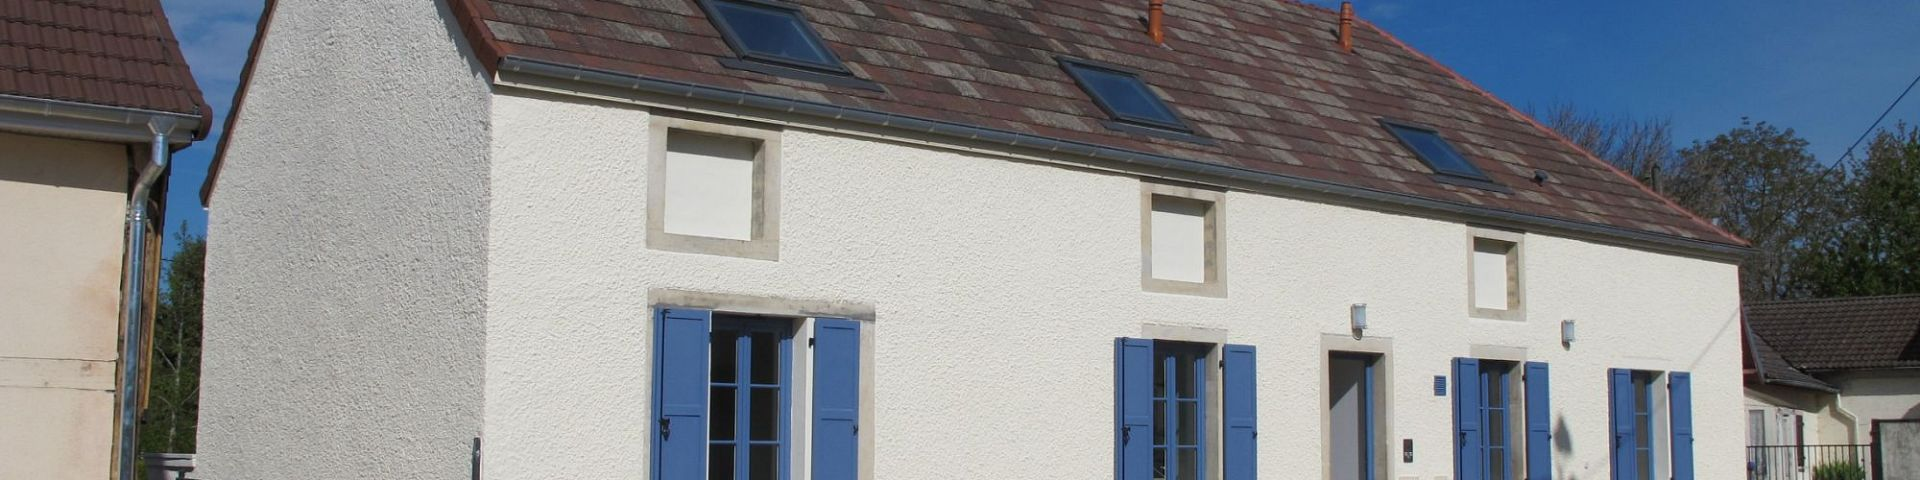 Remilly-sur-Tille - Bâtiment communal (21)